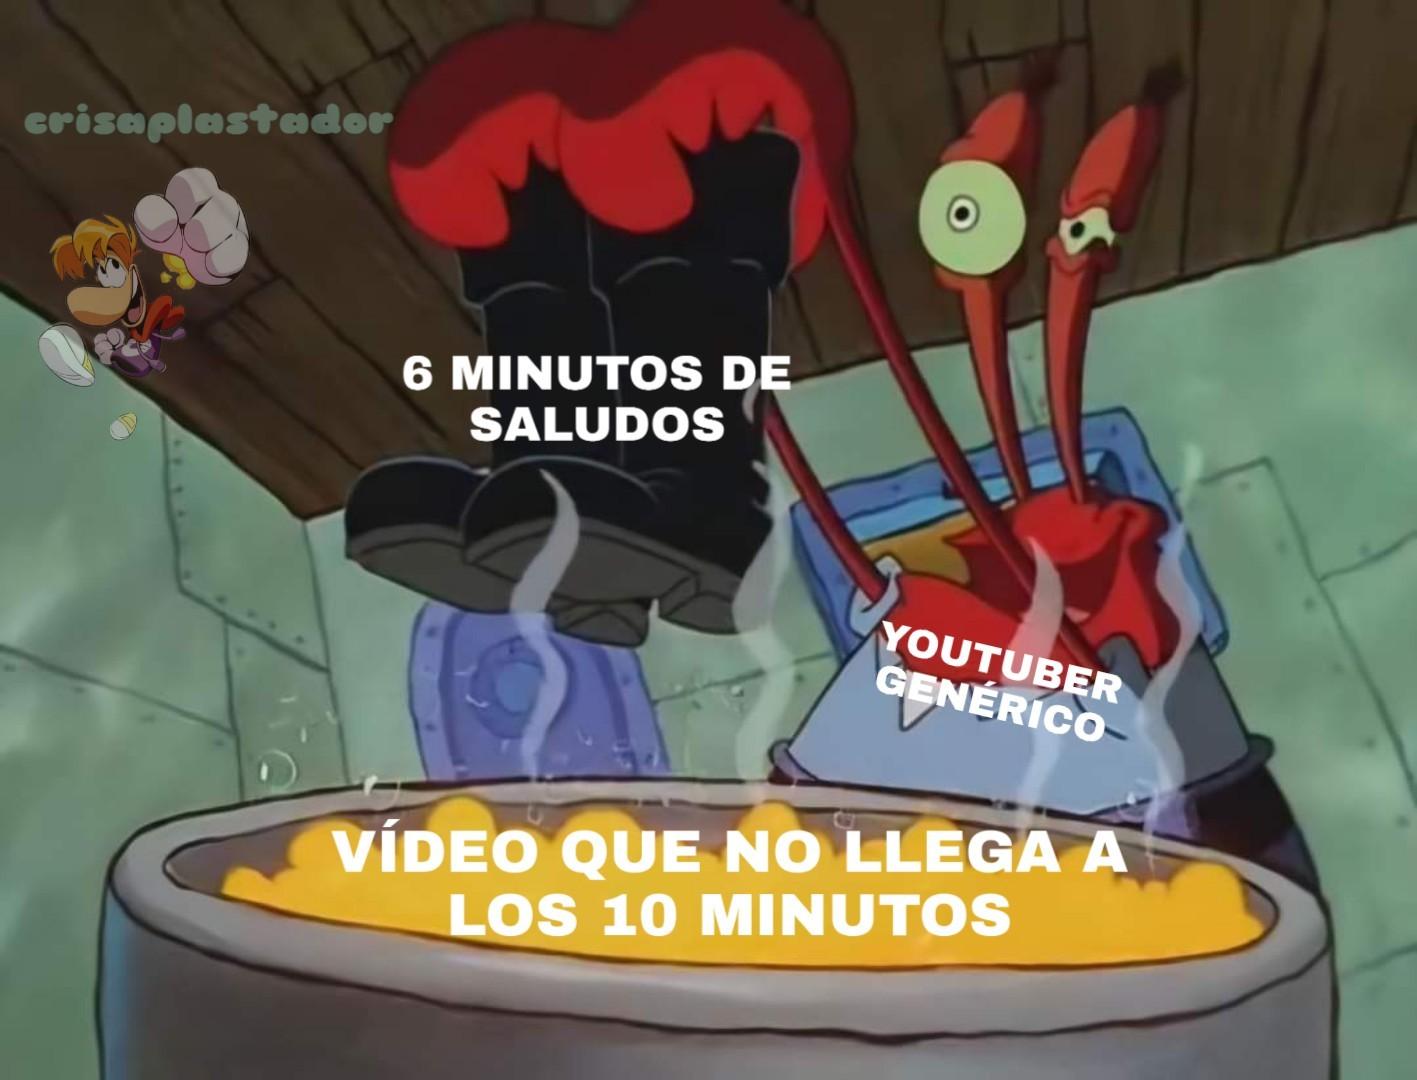 Undea 2 be like XD - meme